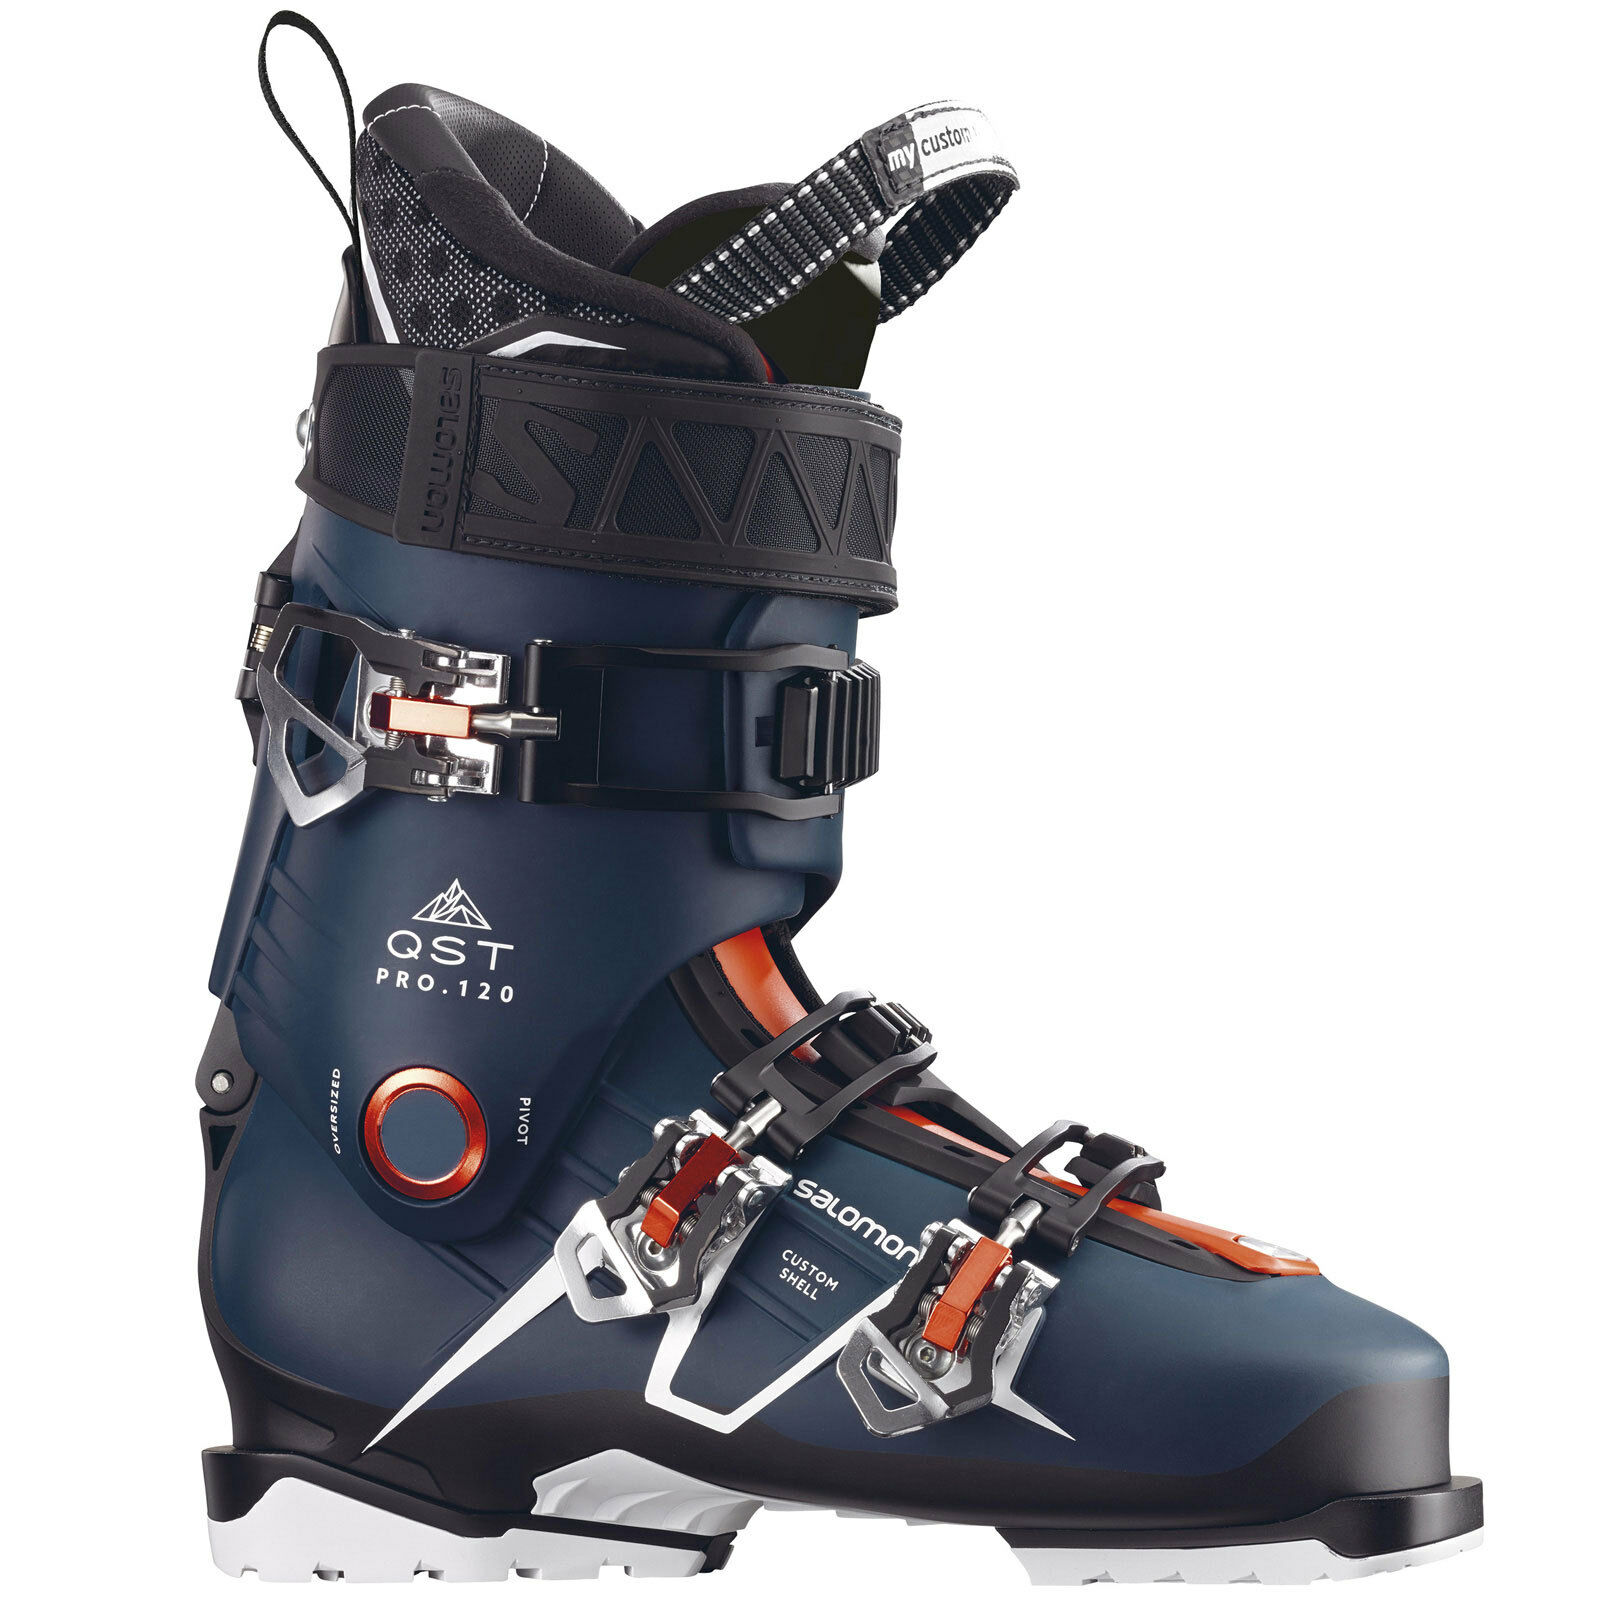 Salomon QST Pro 120 Herren Herren Herren Skistiefel Skischuh SkiStiefel All Mountain Piste NEU c1ec5f